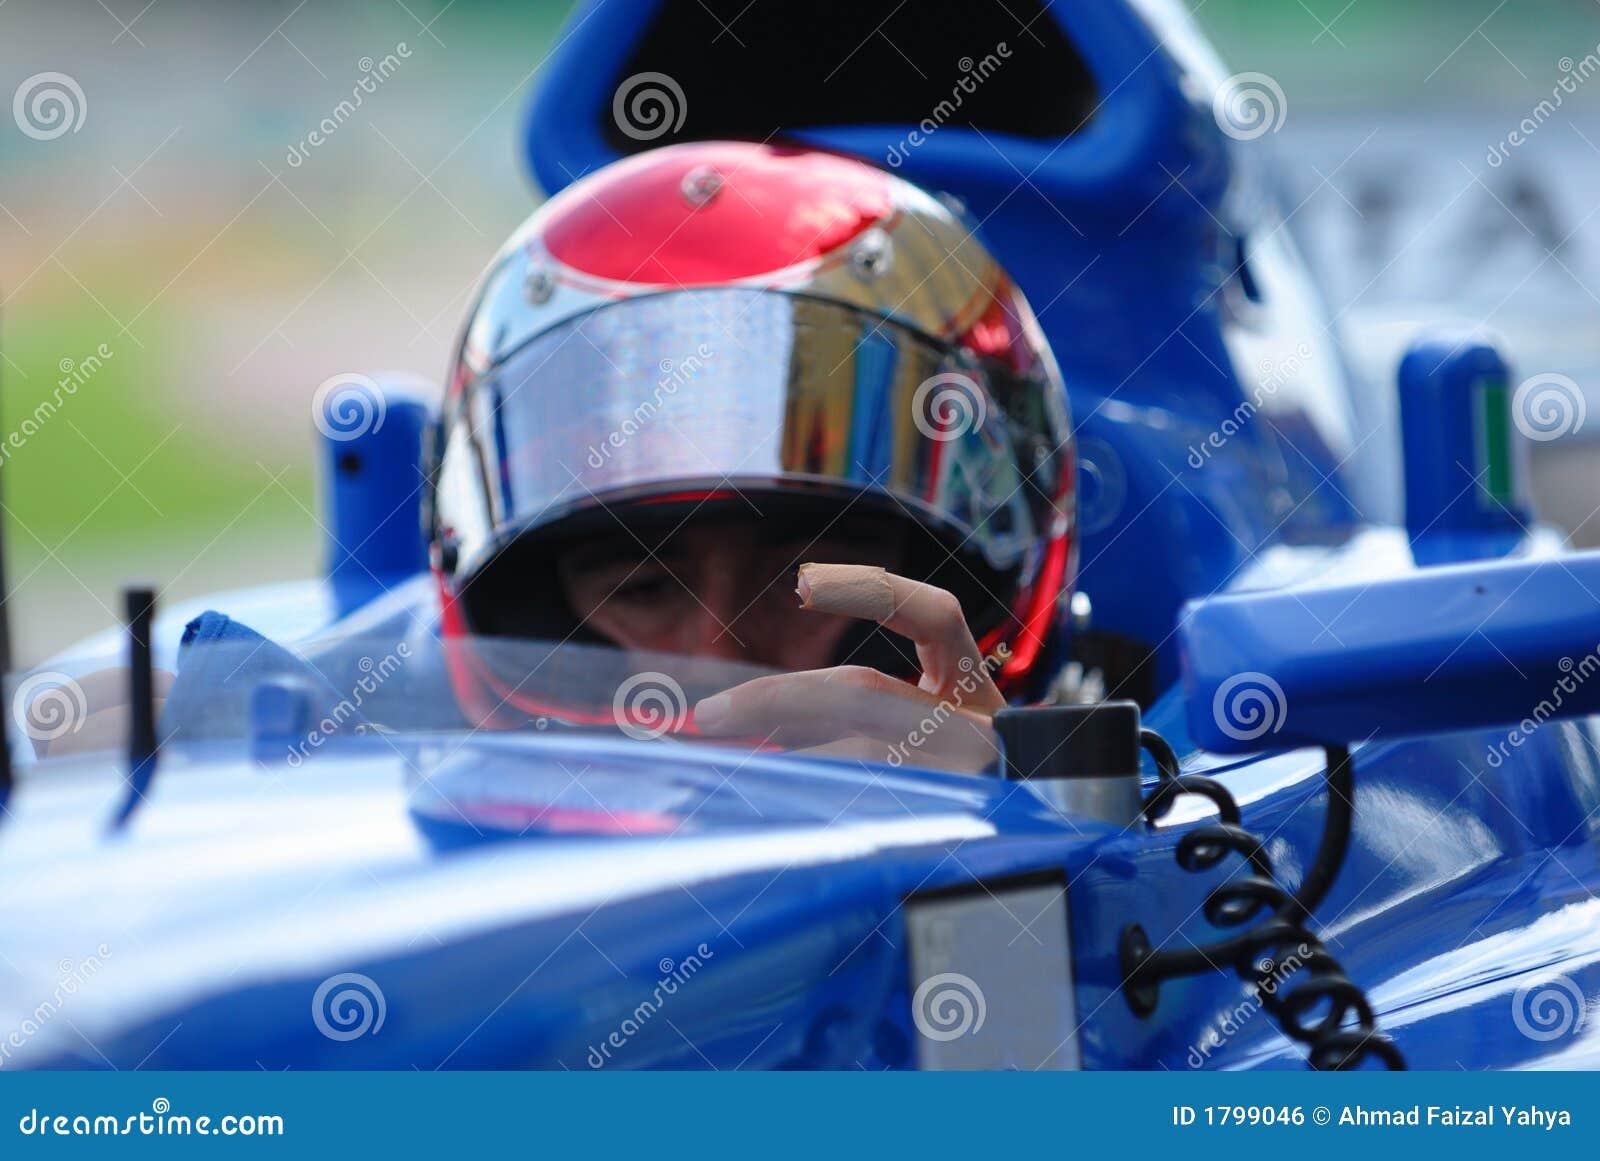 A1 Grand Prix in Sepang Malaysia